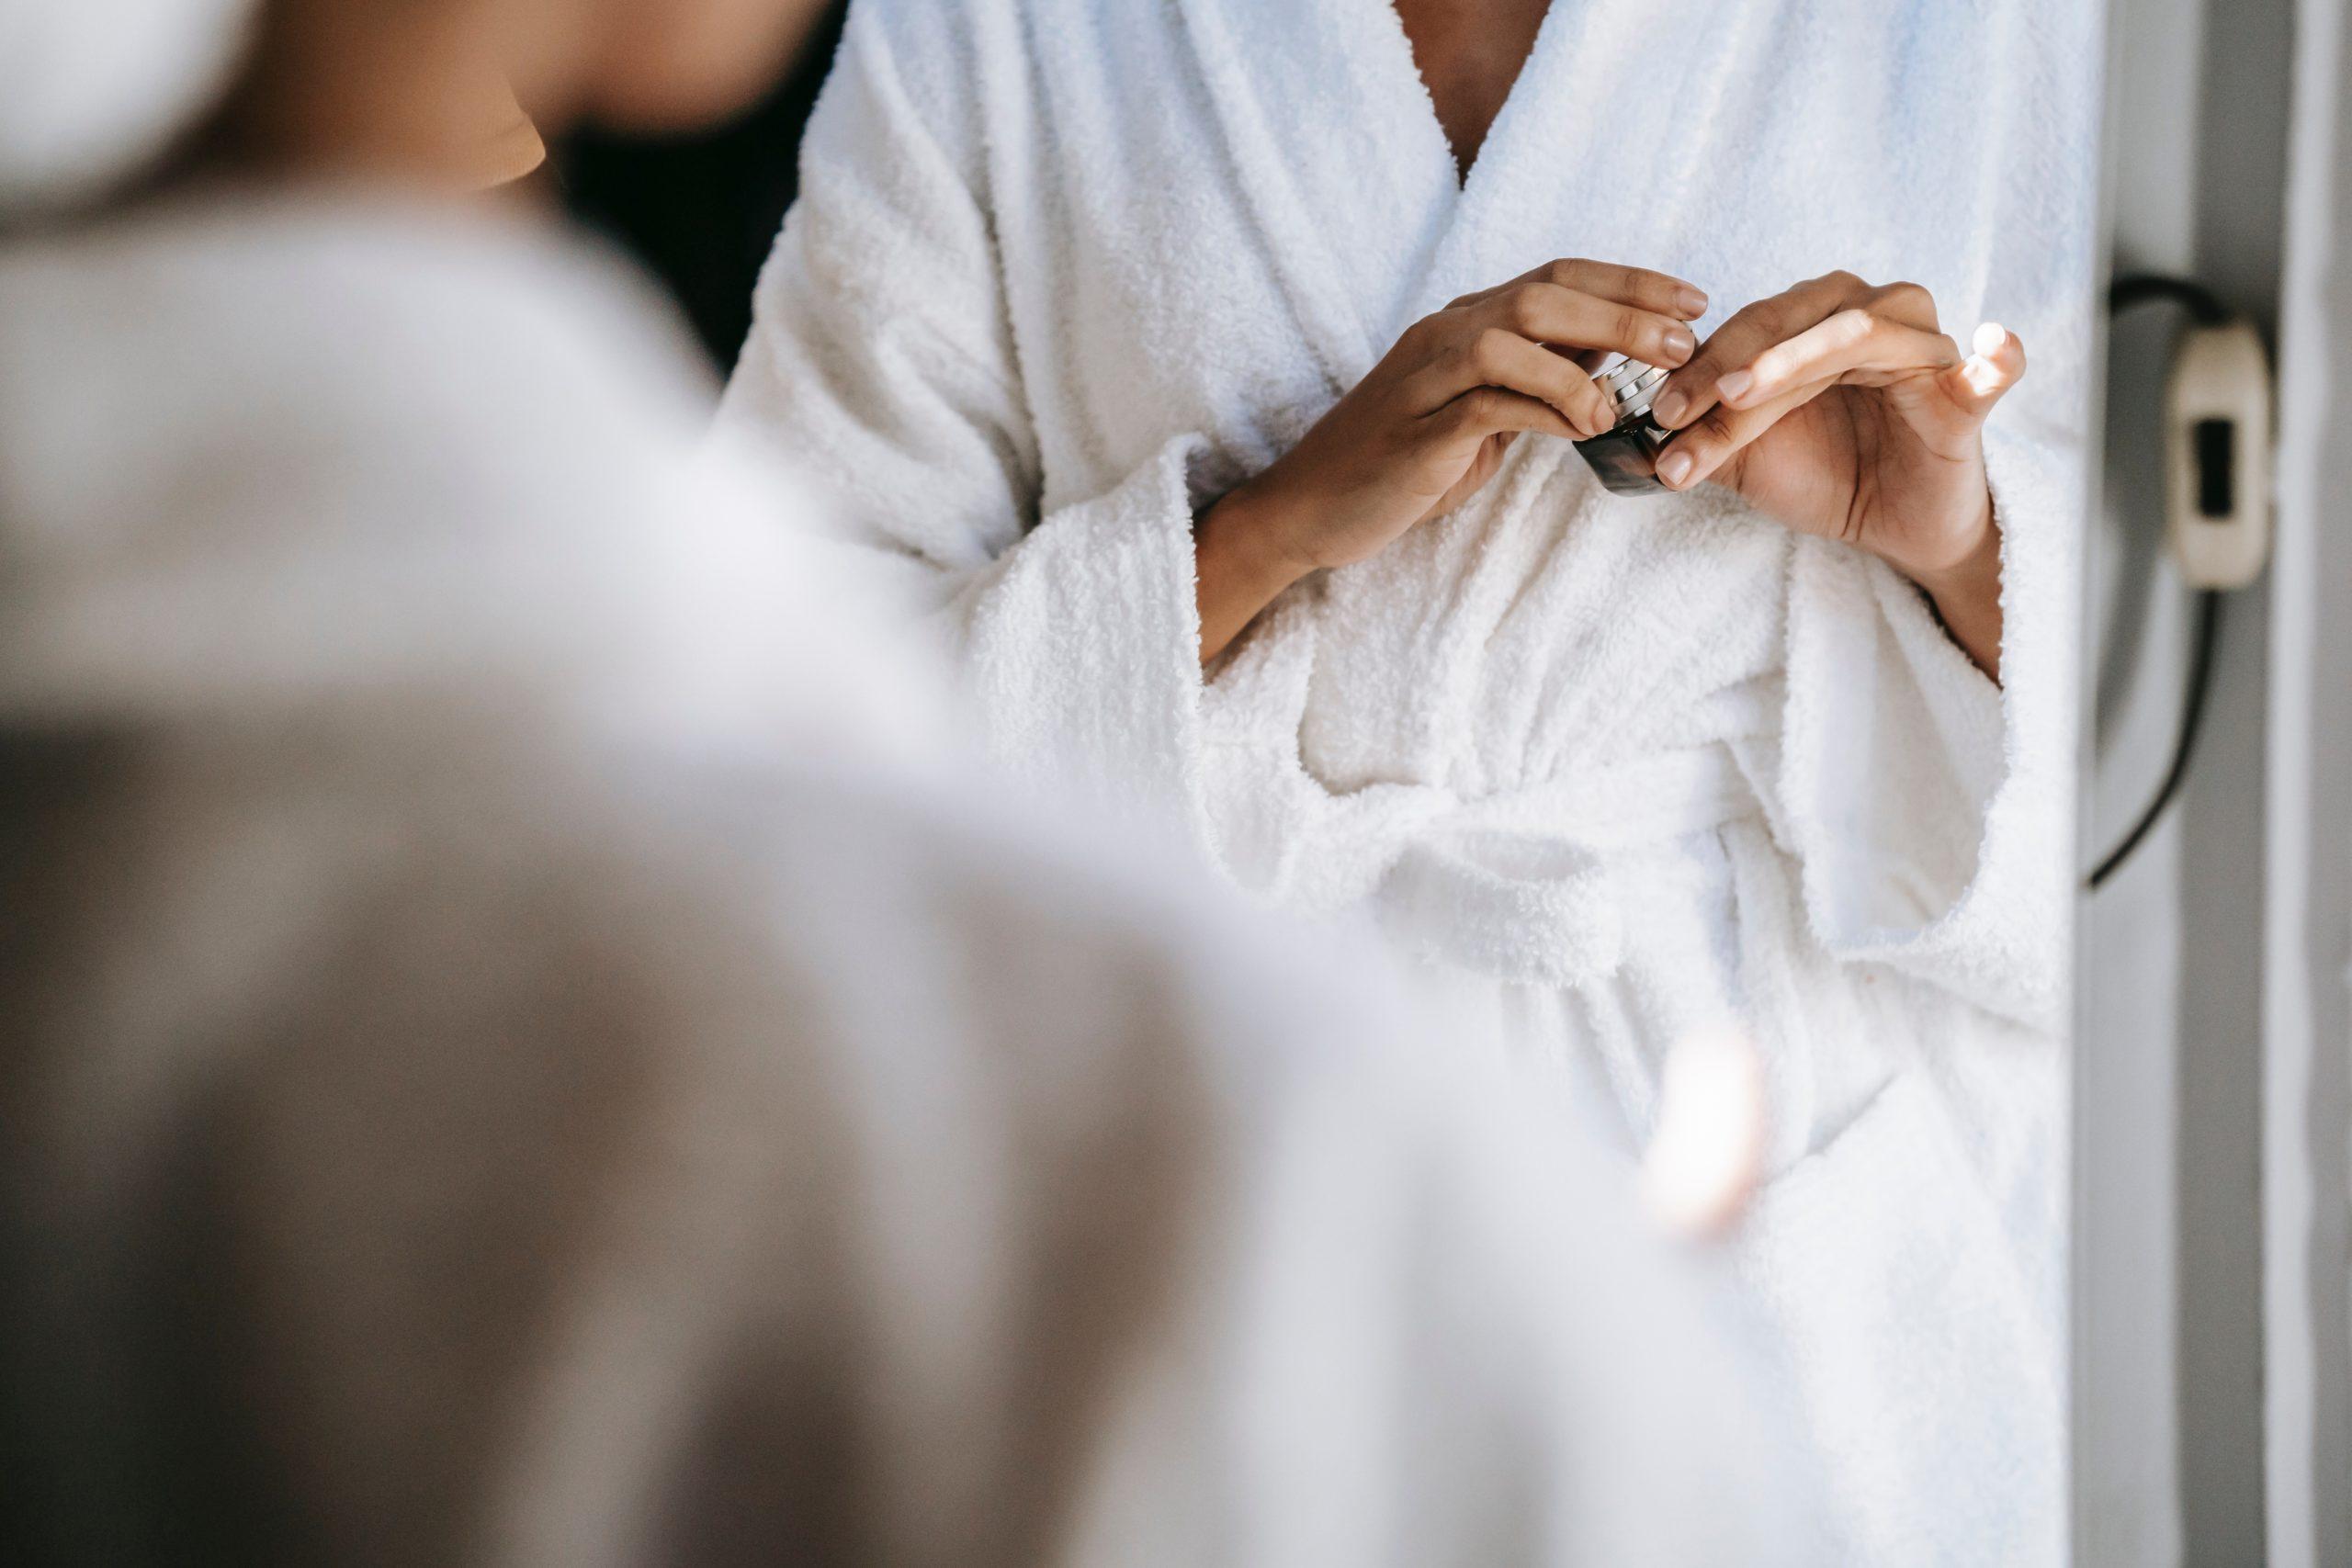 Die eigene Körperpflege